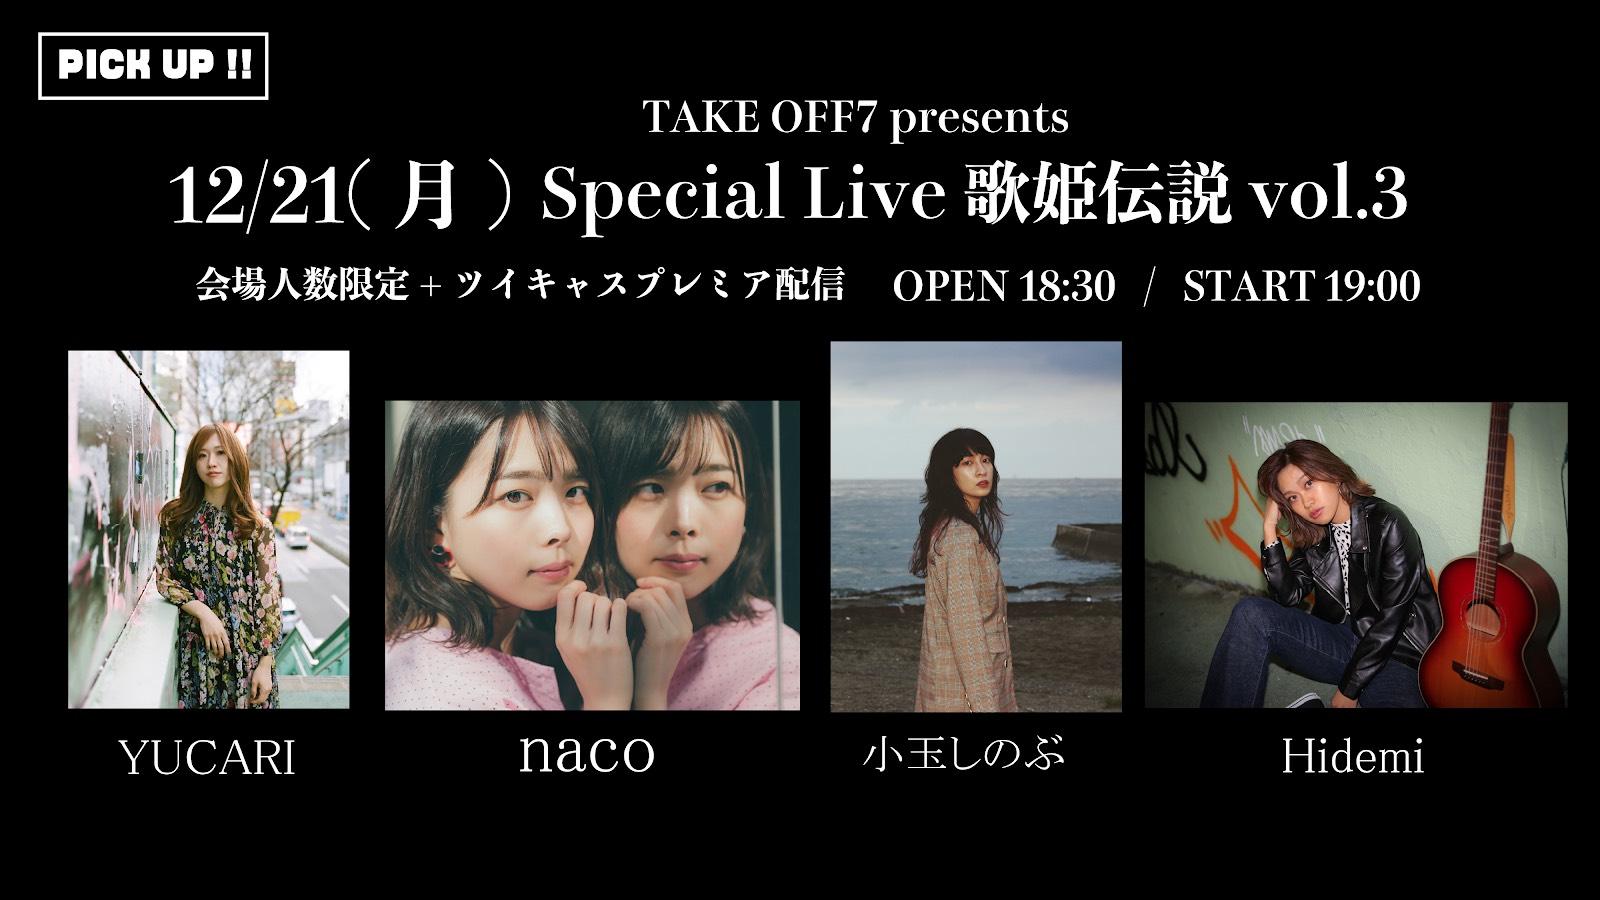 TAKEOFF7 presents 歌姫伝説 Special Live vol.3